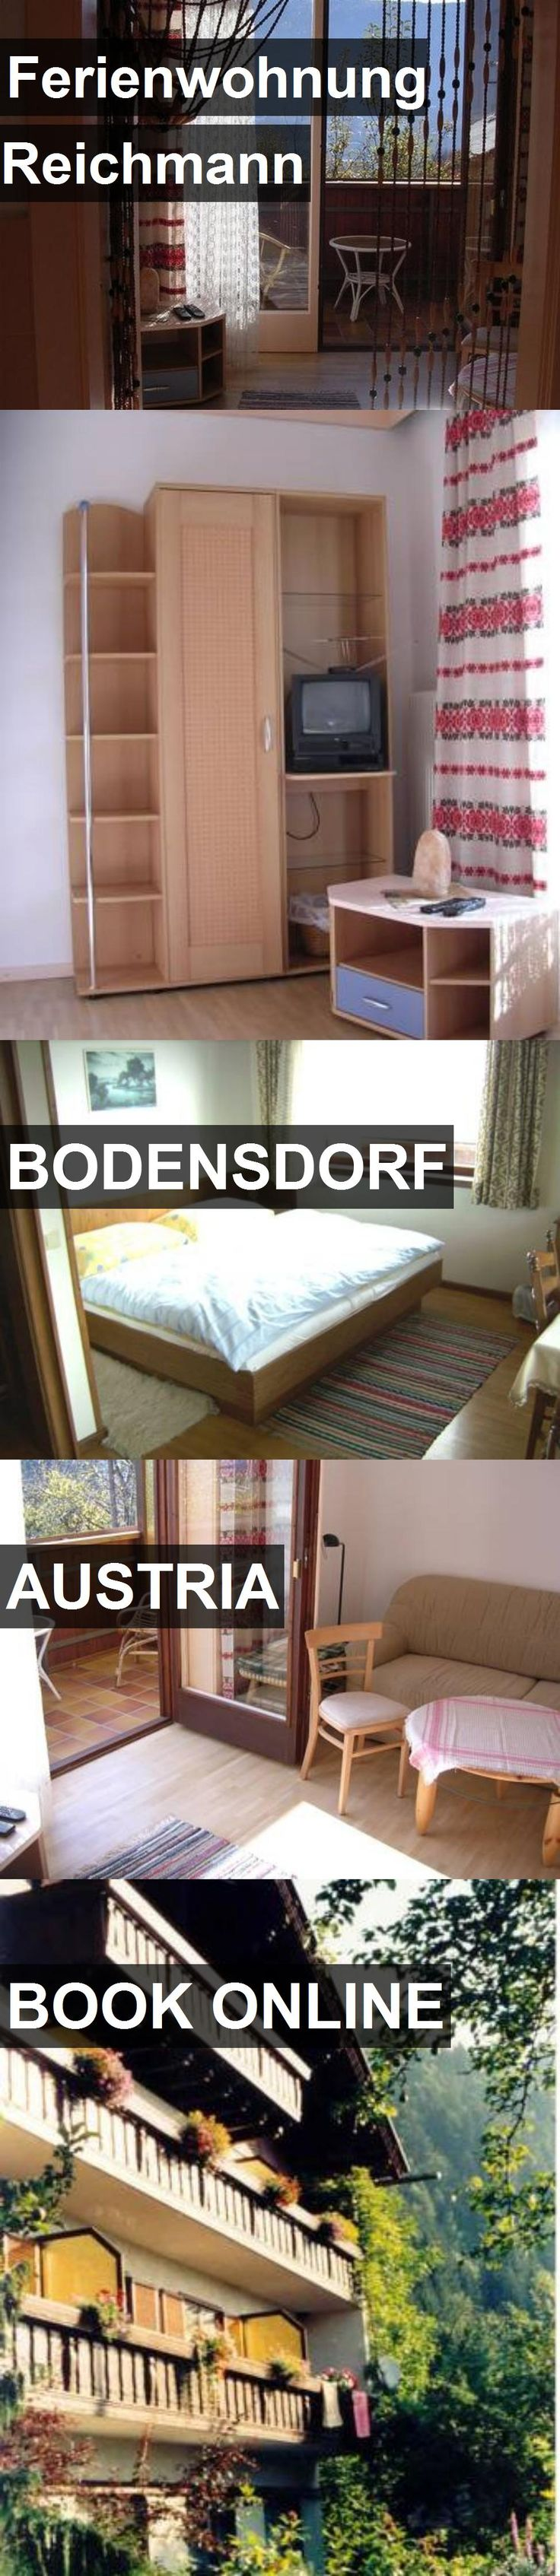 Hotel Ferienwohnung Reichmann in Bodensdorf, Austria. For more information, photos, reviews and best prices please follow the link. #Austria #Bodensdorf #travel #vacation #hotel